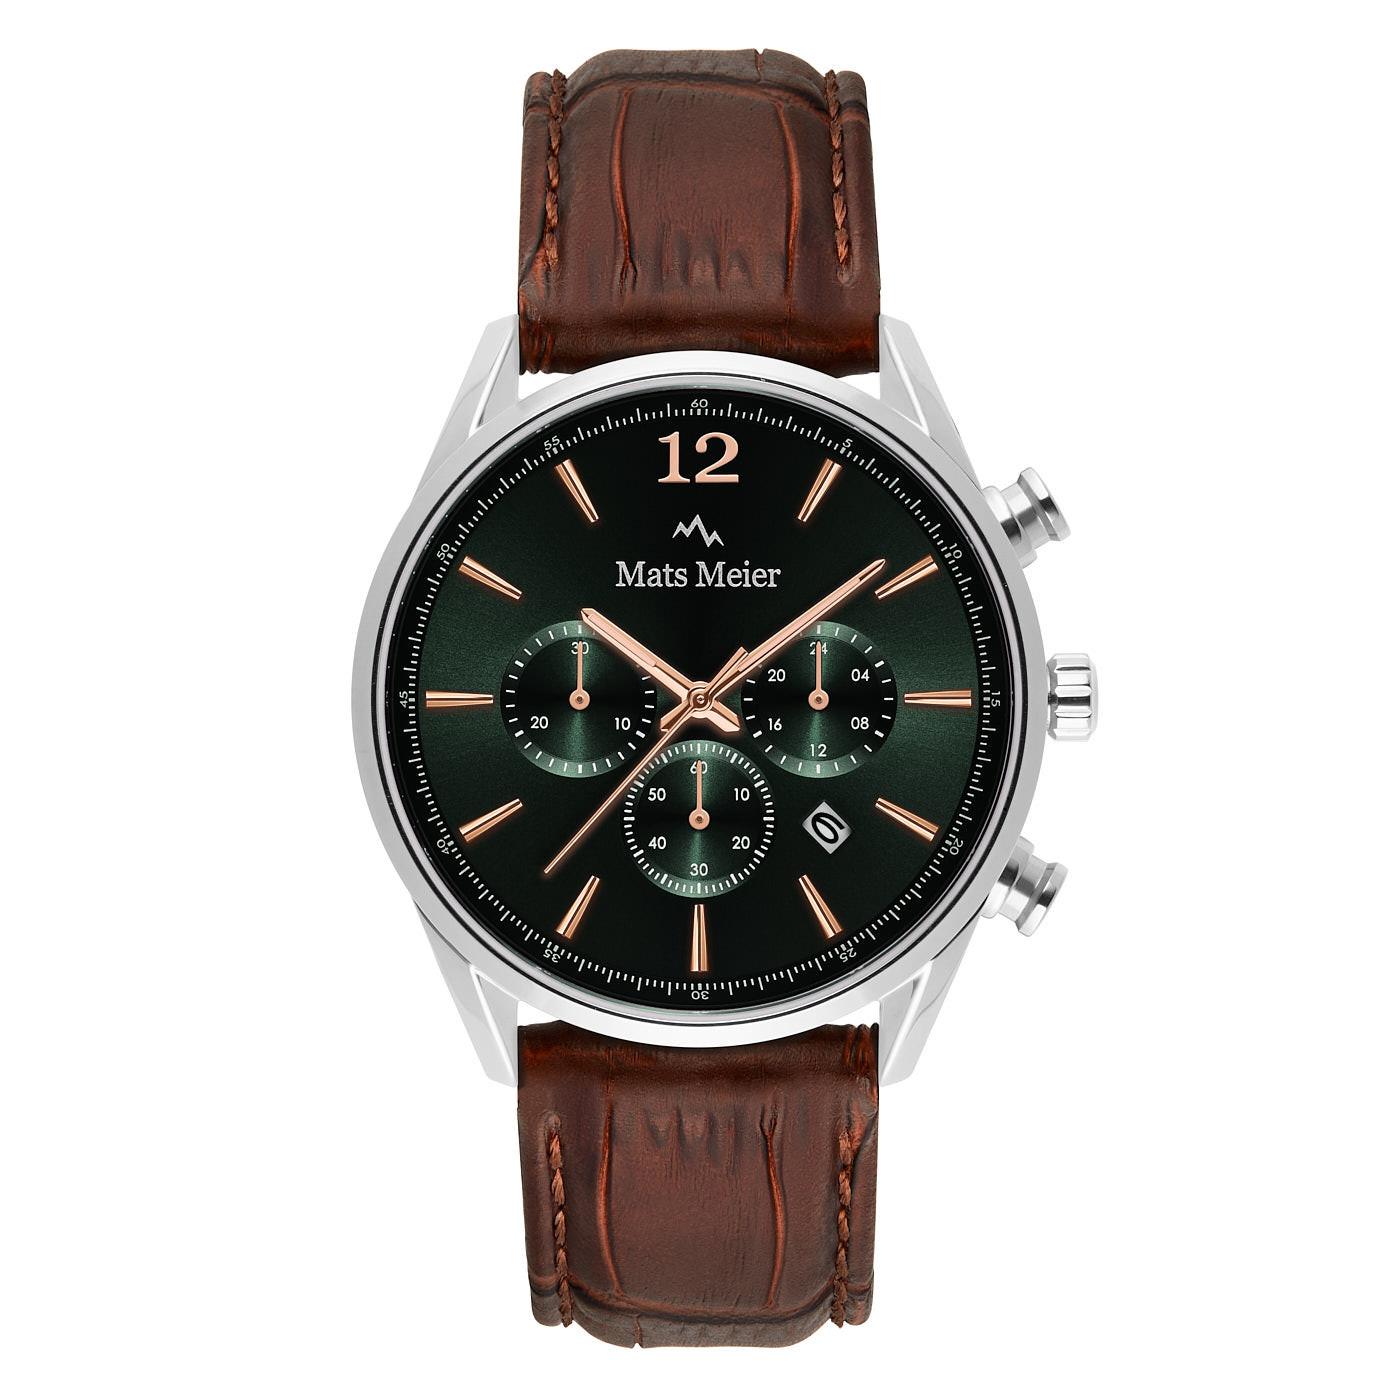 Mats Meier Grand Cornier chronograph mens watch green / silver colored / brown